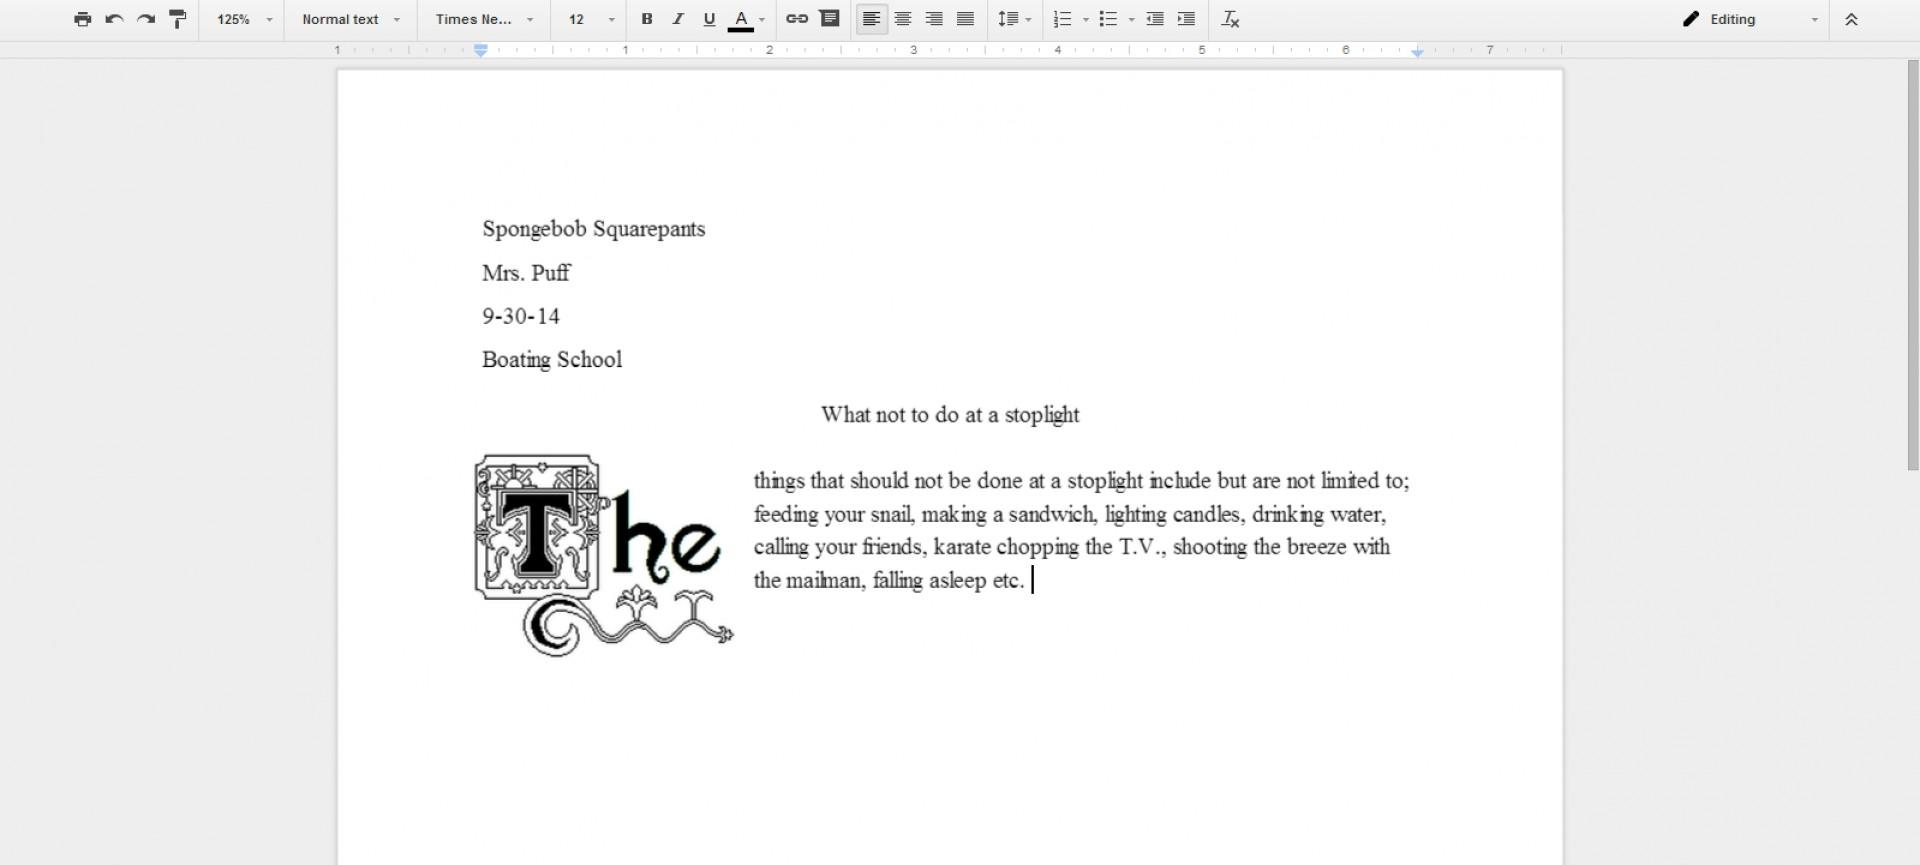 006 Spongebob Essay The H6so62h Unforgettable Copy And Paste Meme Gif Tumblr 1920